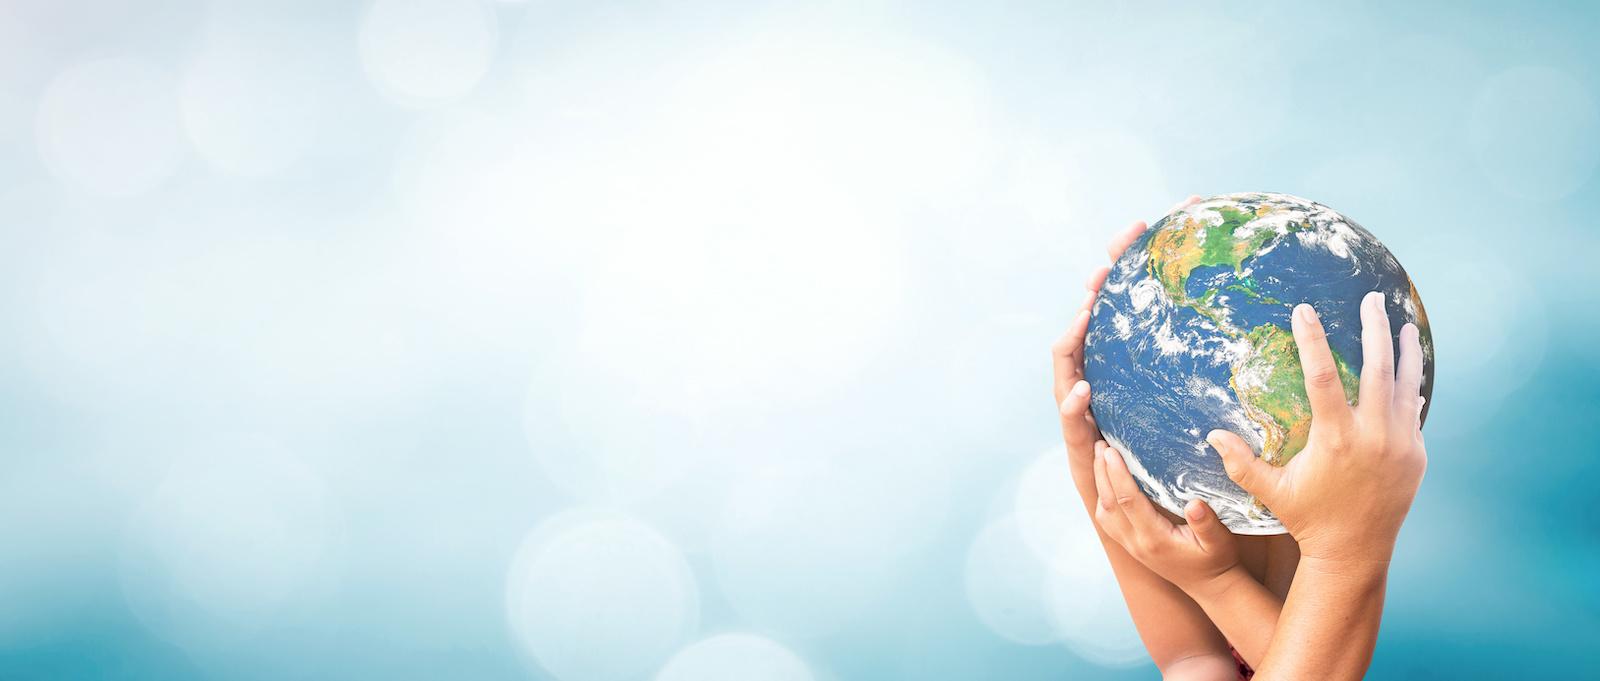 Milieumanagementsysteem milieuhandboek